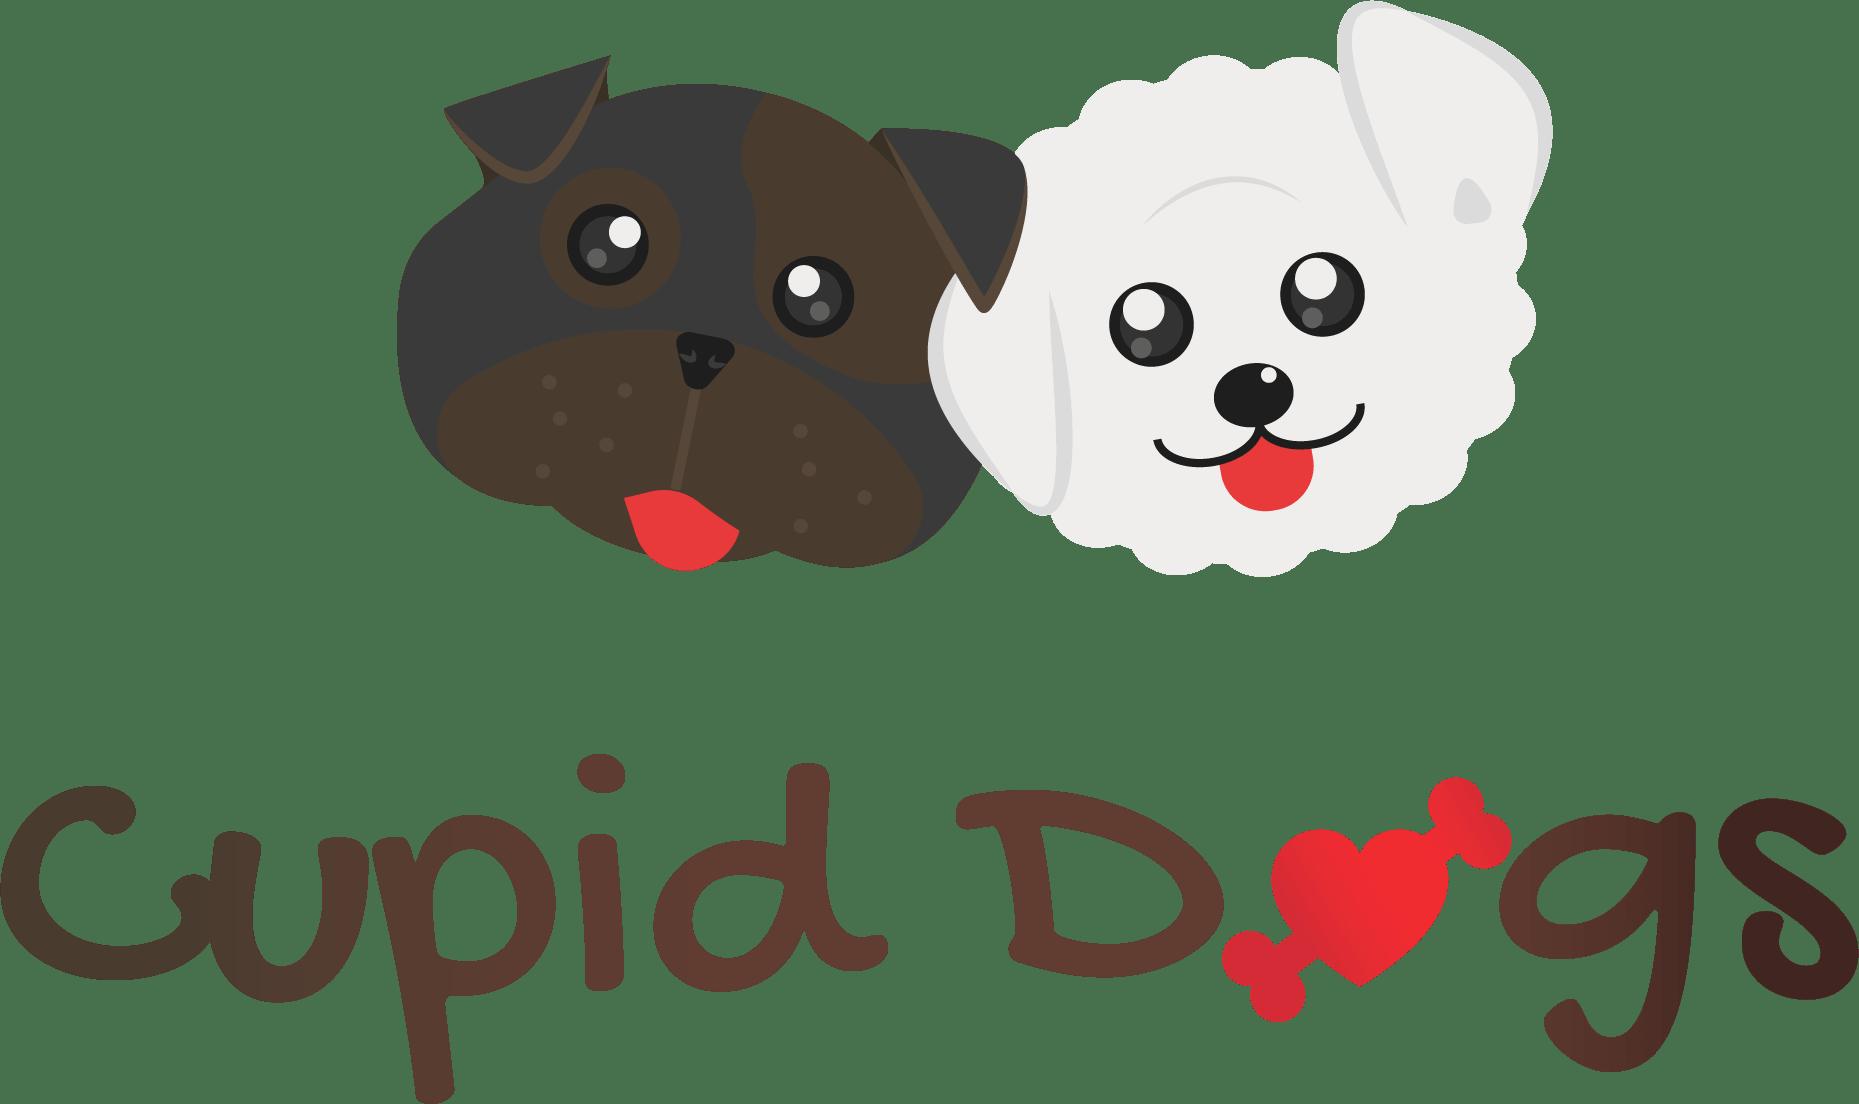 Cupid Dogs -